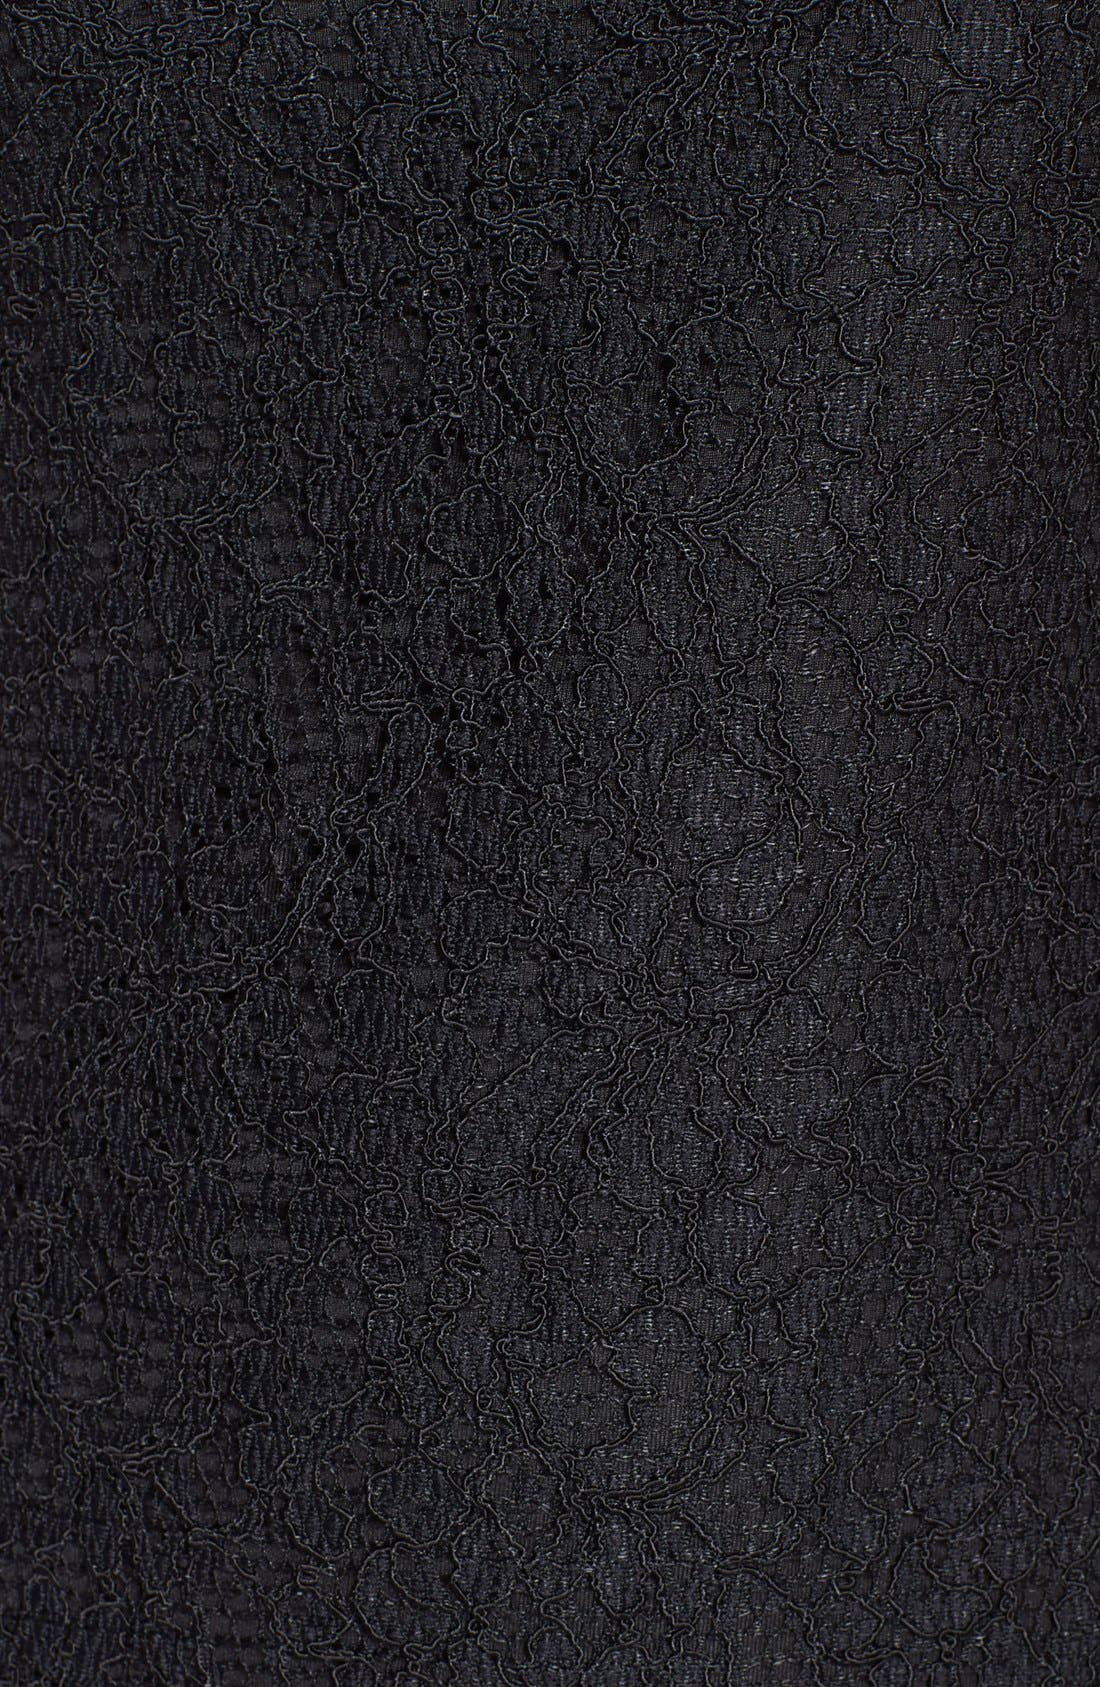 Boatneck Lace Sheath Dress,                             Alternate thumbnail 99, color,